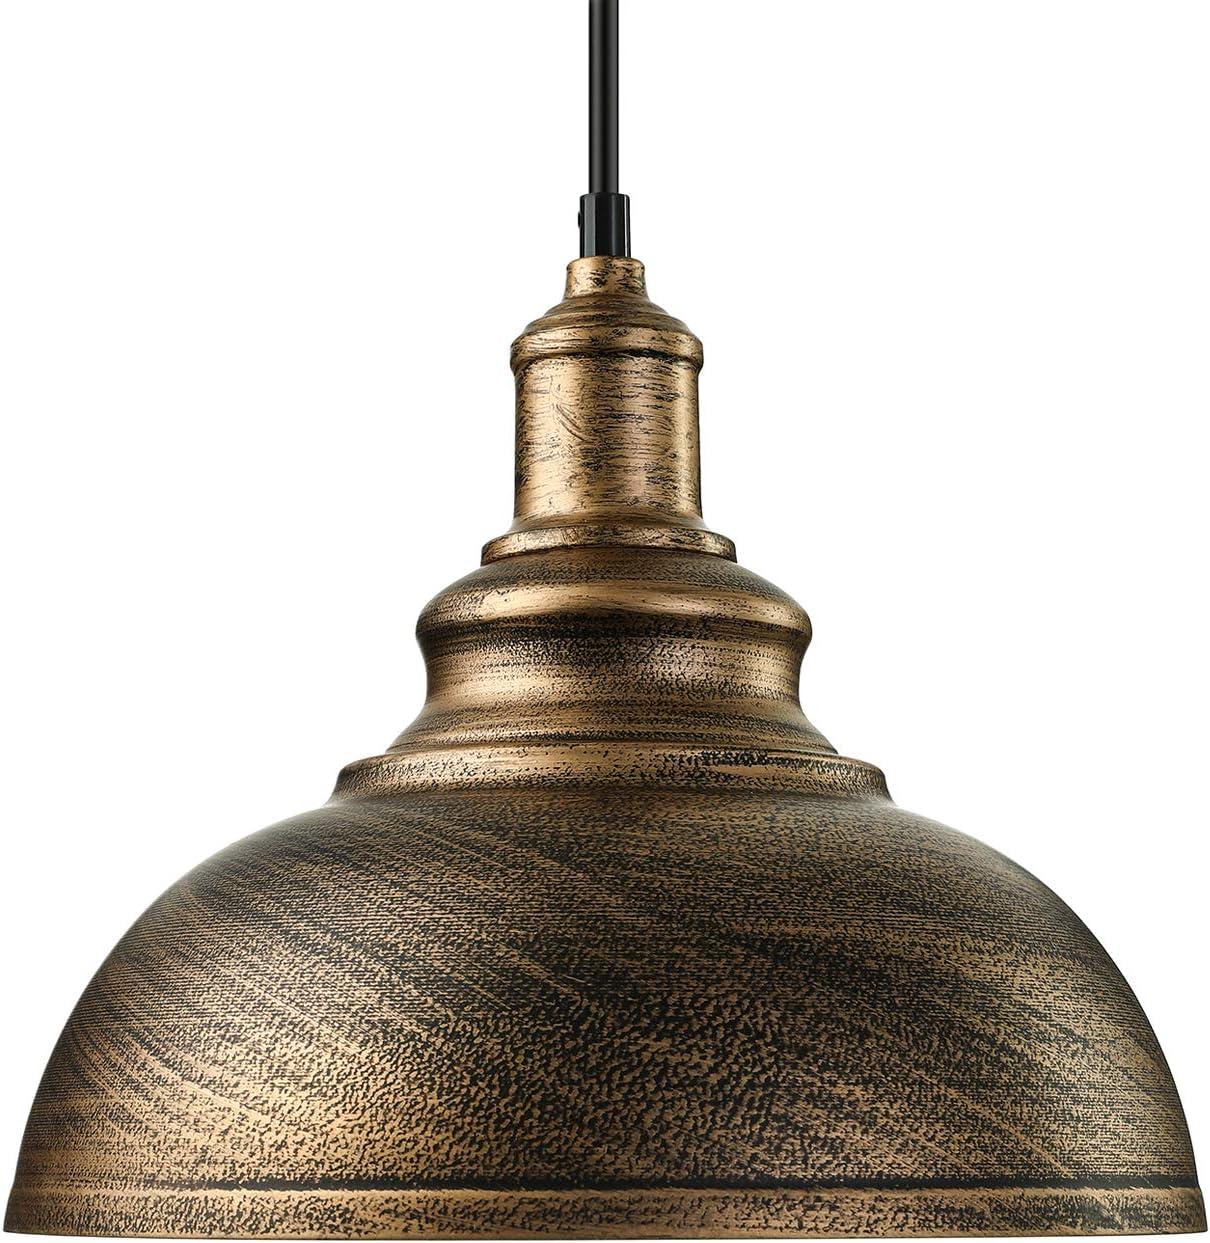 Baycheer Plafón colgante, lámpara industrial vintage, lámpara de pantalla, E27,Diámetro 30cm, altura regulable, Kupferbraun, E27 40.00 wattsW 110.00 voltsV